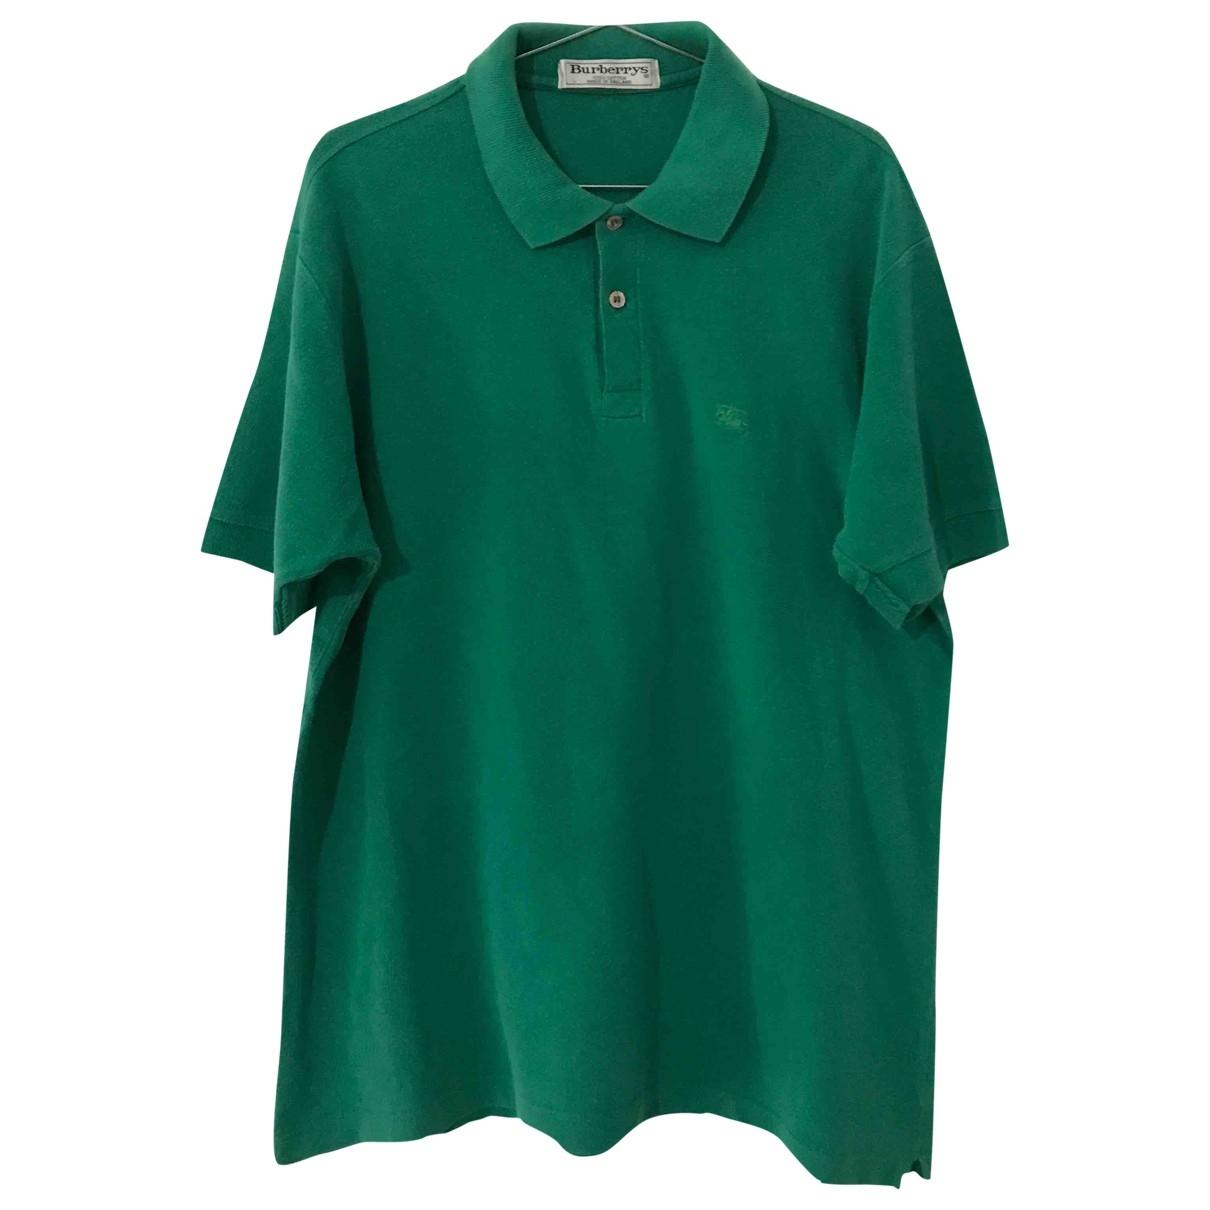 Burberry - Polos   pour homme en coton - vert